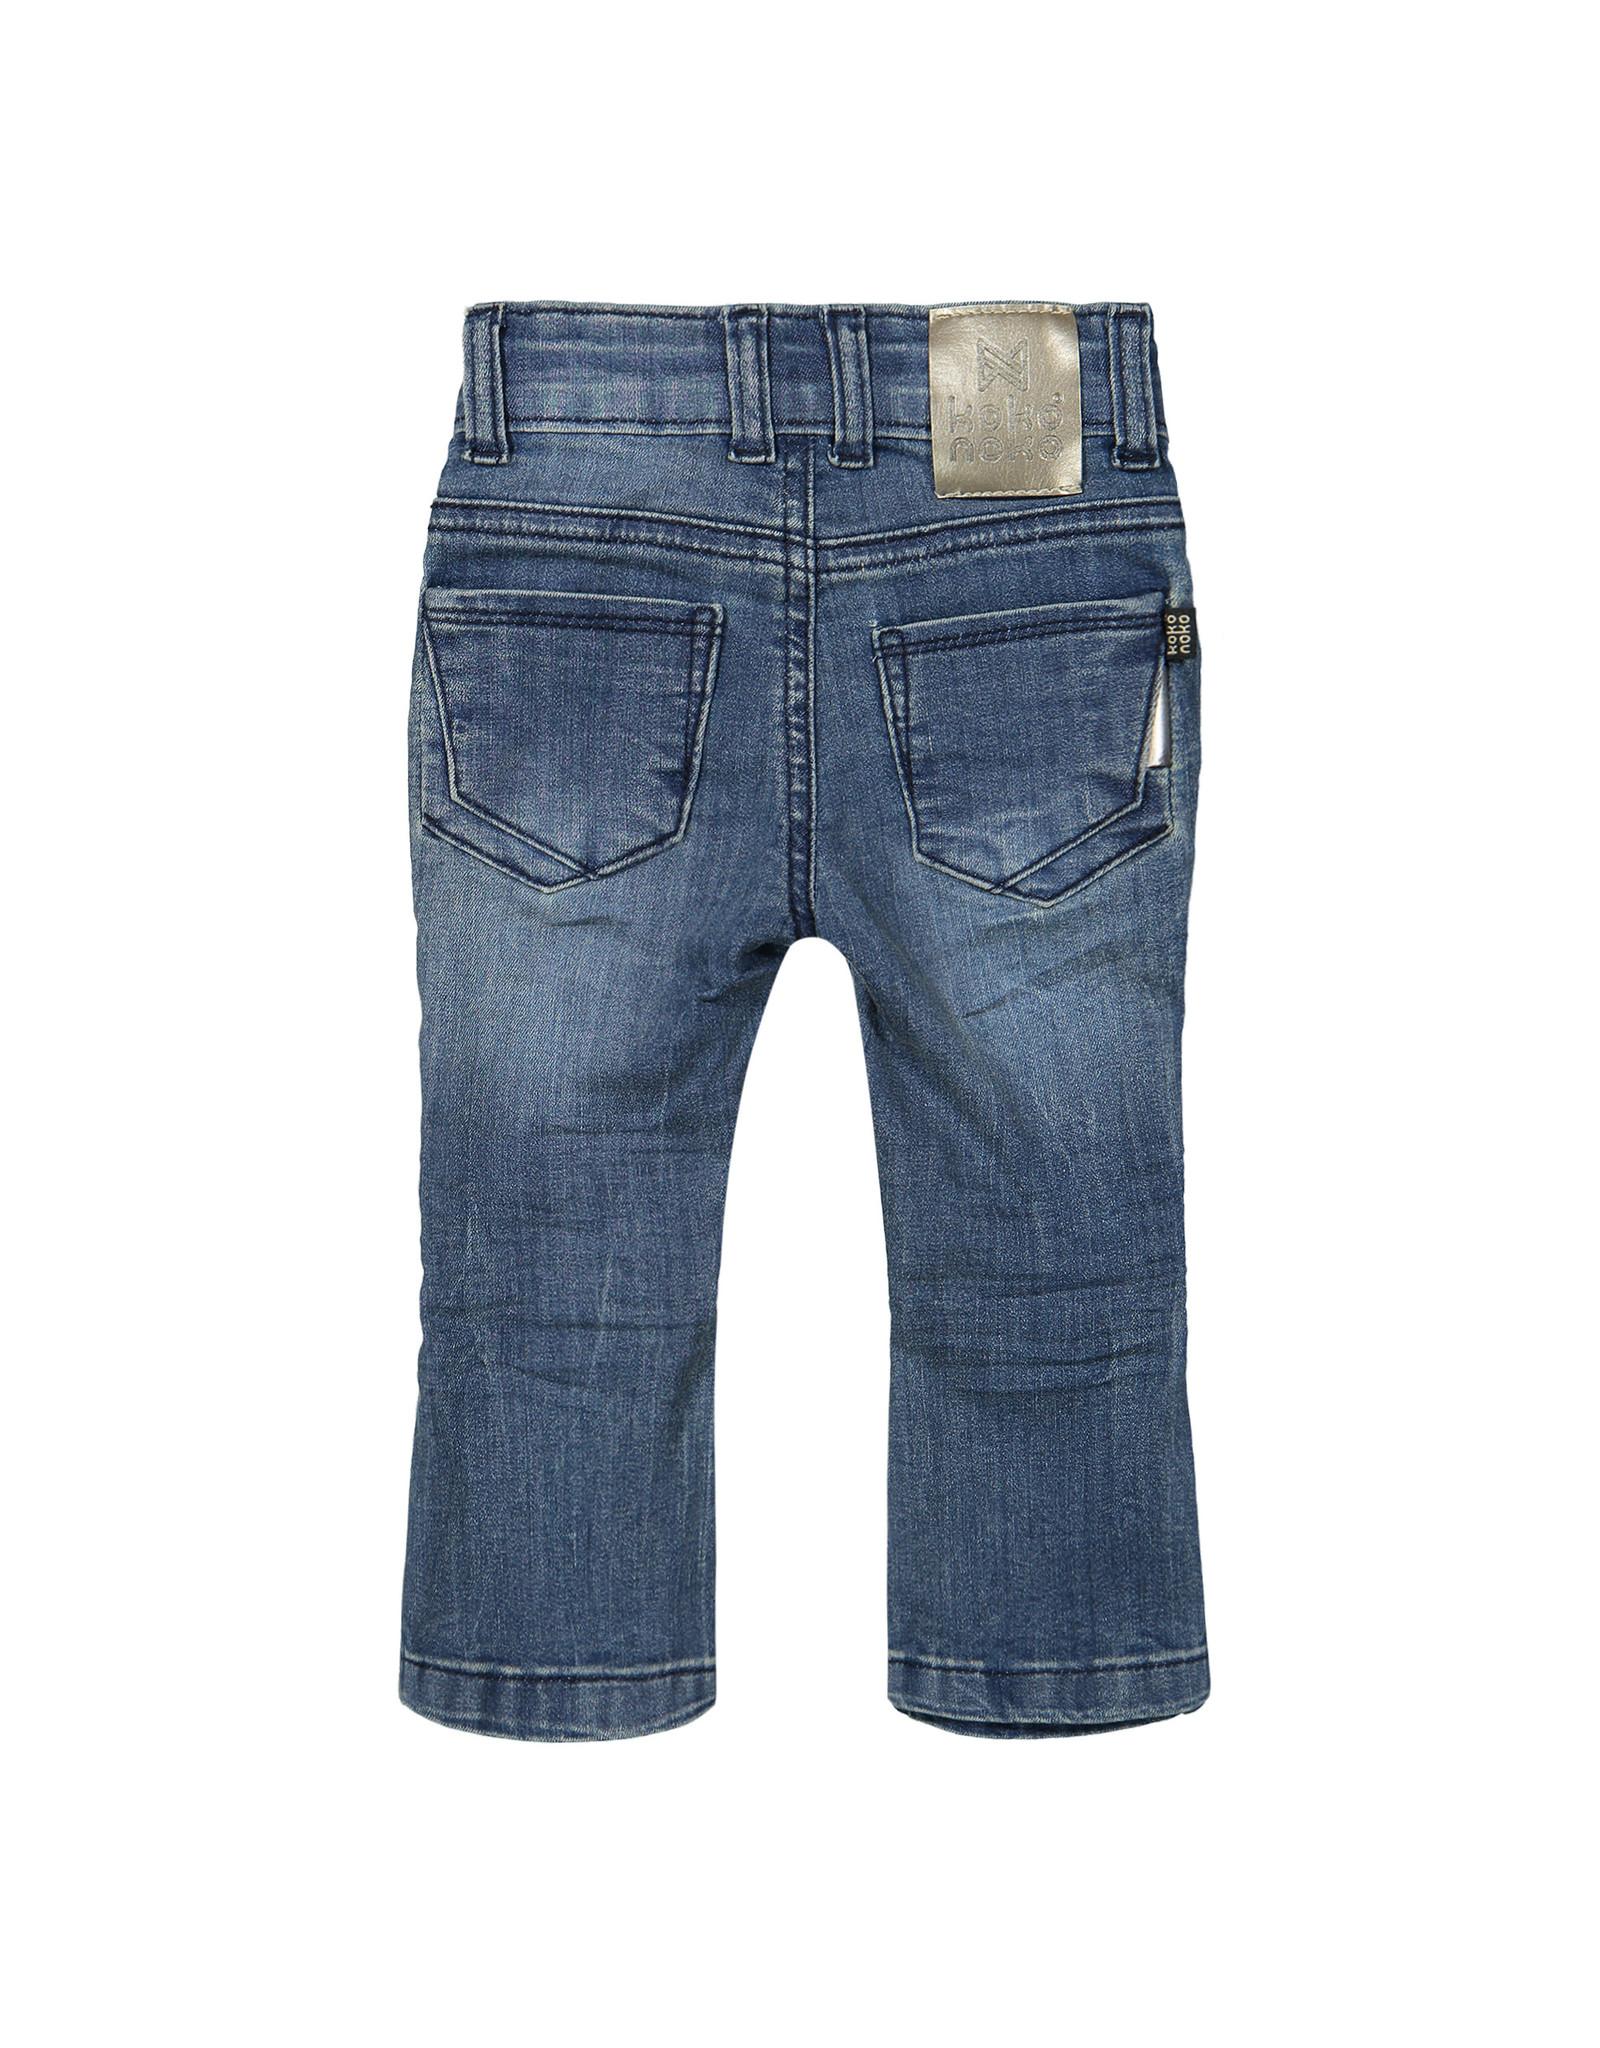 Koko Noko Girls Jeans Bluejeans w21